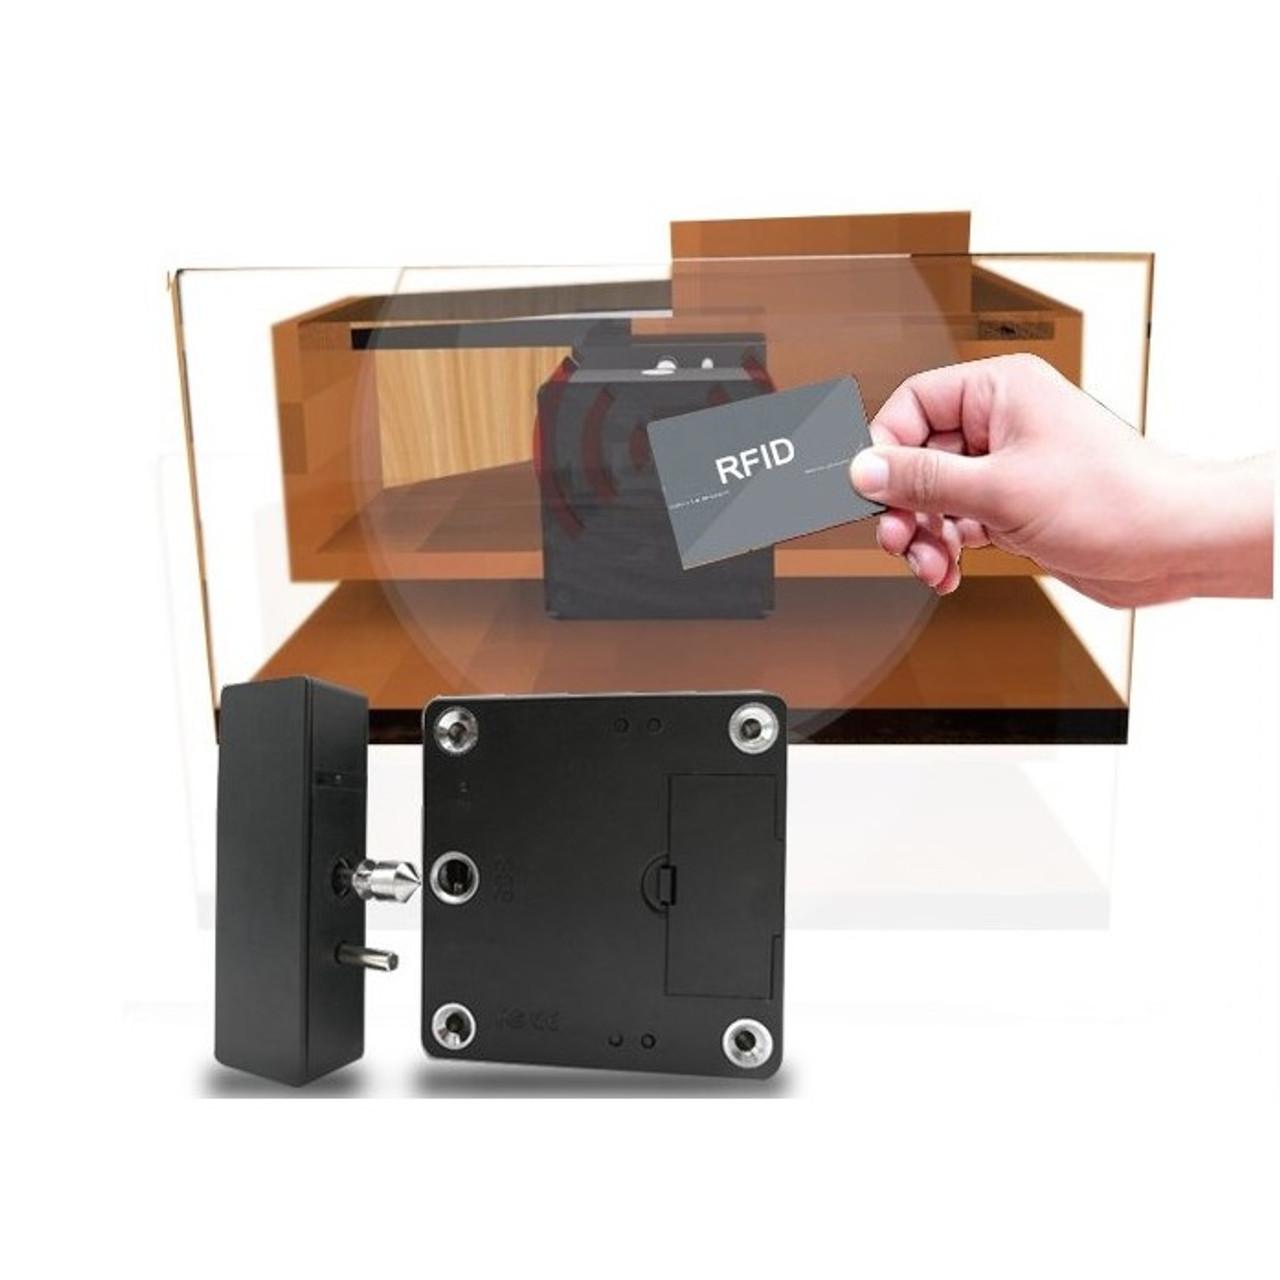 RFID Hidden Cabinet Drawer Lock, 3 Keys - Gun Safes,Stands, cabinets-13 56  Mhz